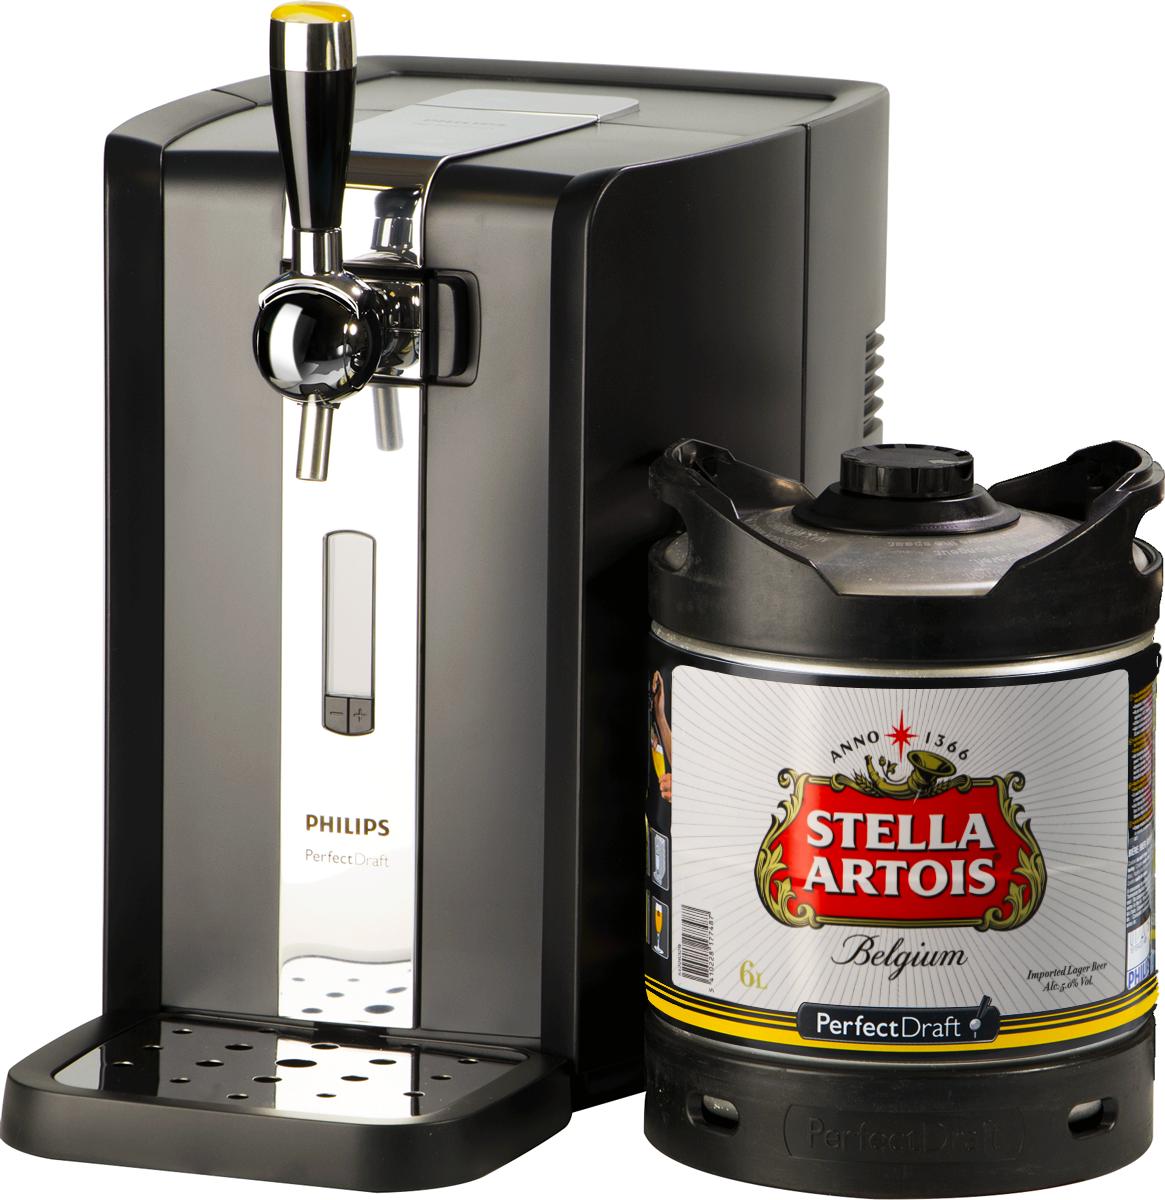 Pack grifo PerfectDraft Stella Artois